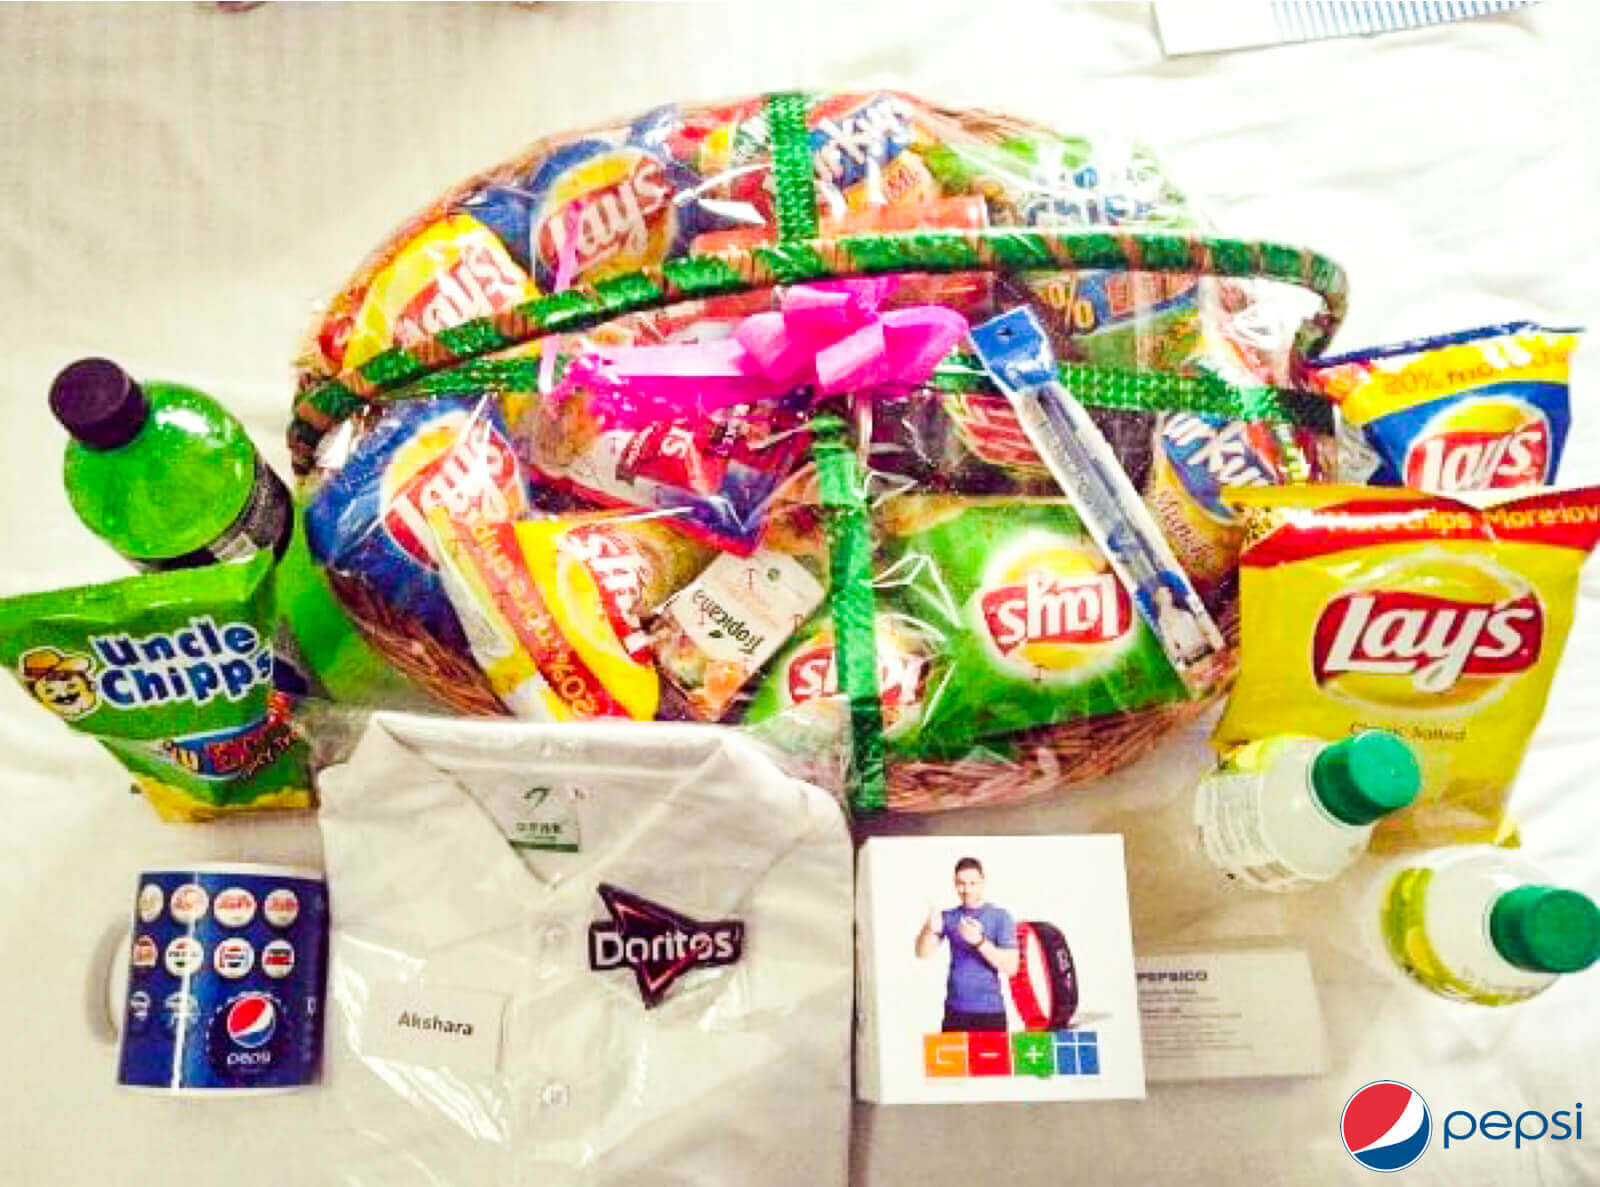 Pepsi Co welcome kit